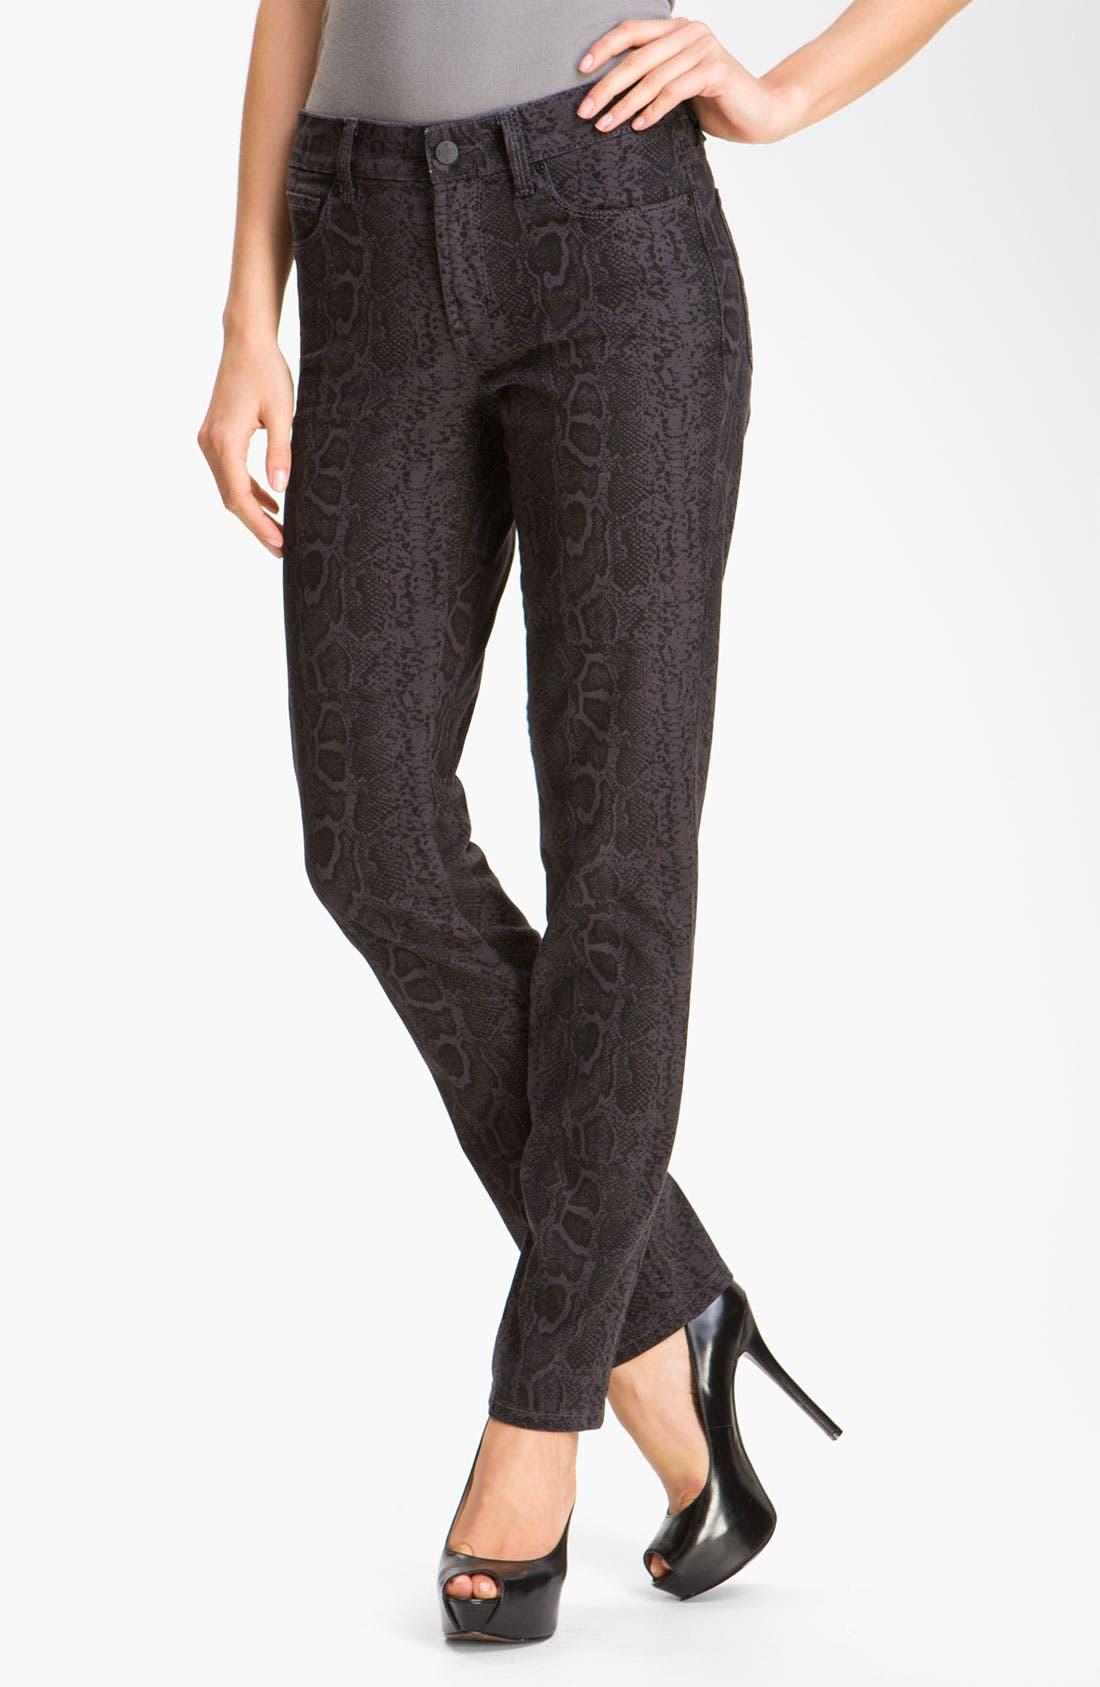 Alternate Image 1 Selected - NYDJ 'Sheri' Python Print Skinny Twill Jeans